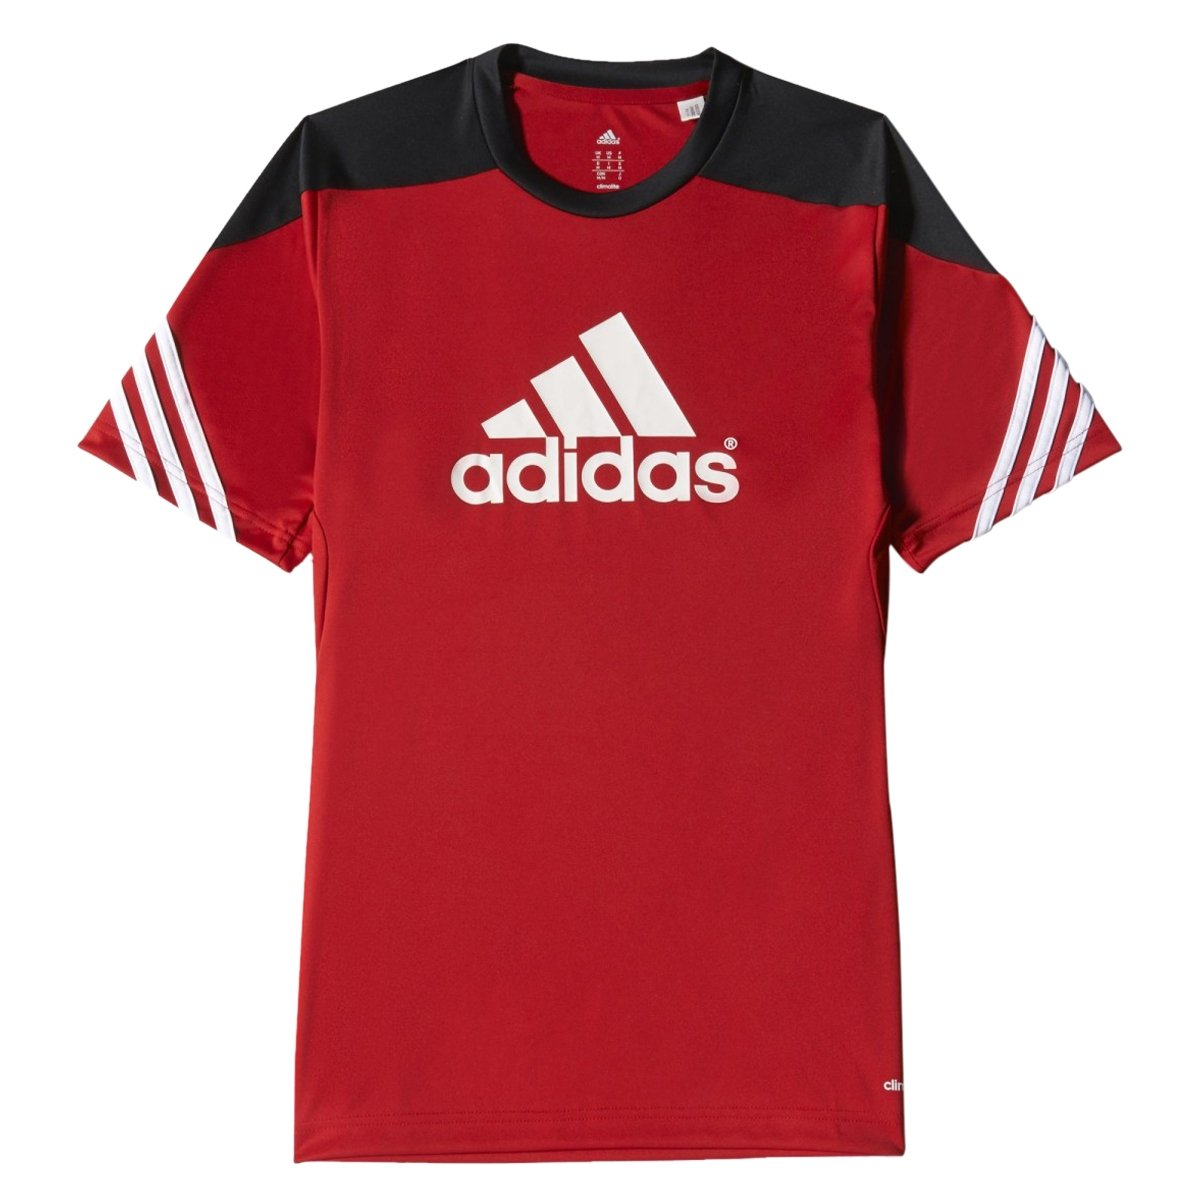 Camiseta Masculina Adidas Treino Sere 14 D82940